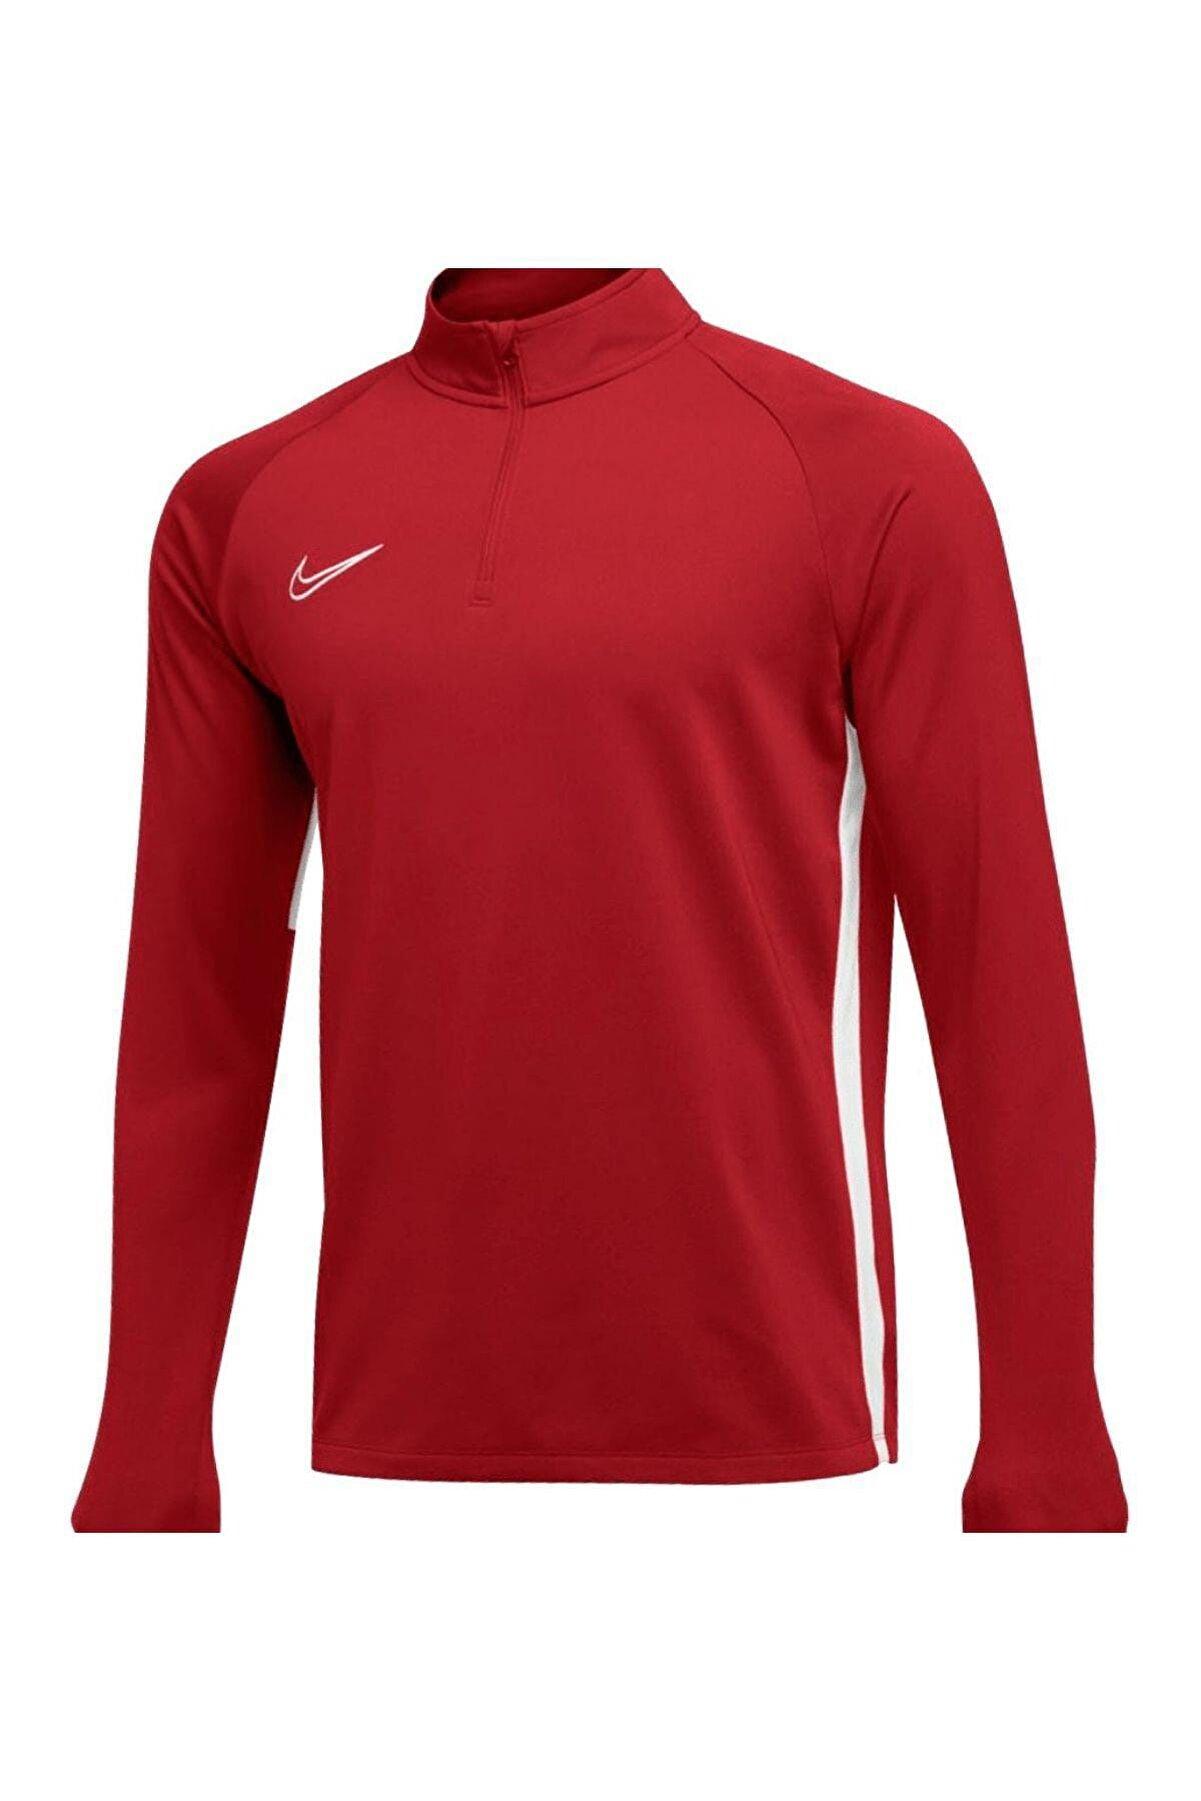 Nike AJ9094-657 M NK DRY ACDMY19 DRIL TOP Erkek T-Shirt